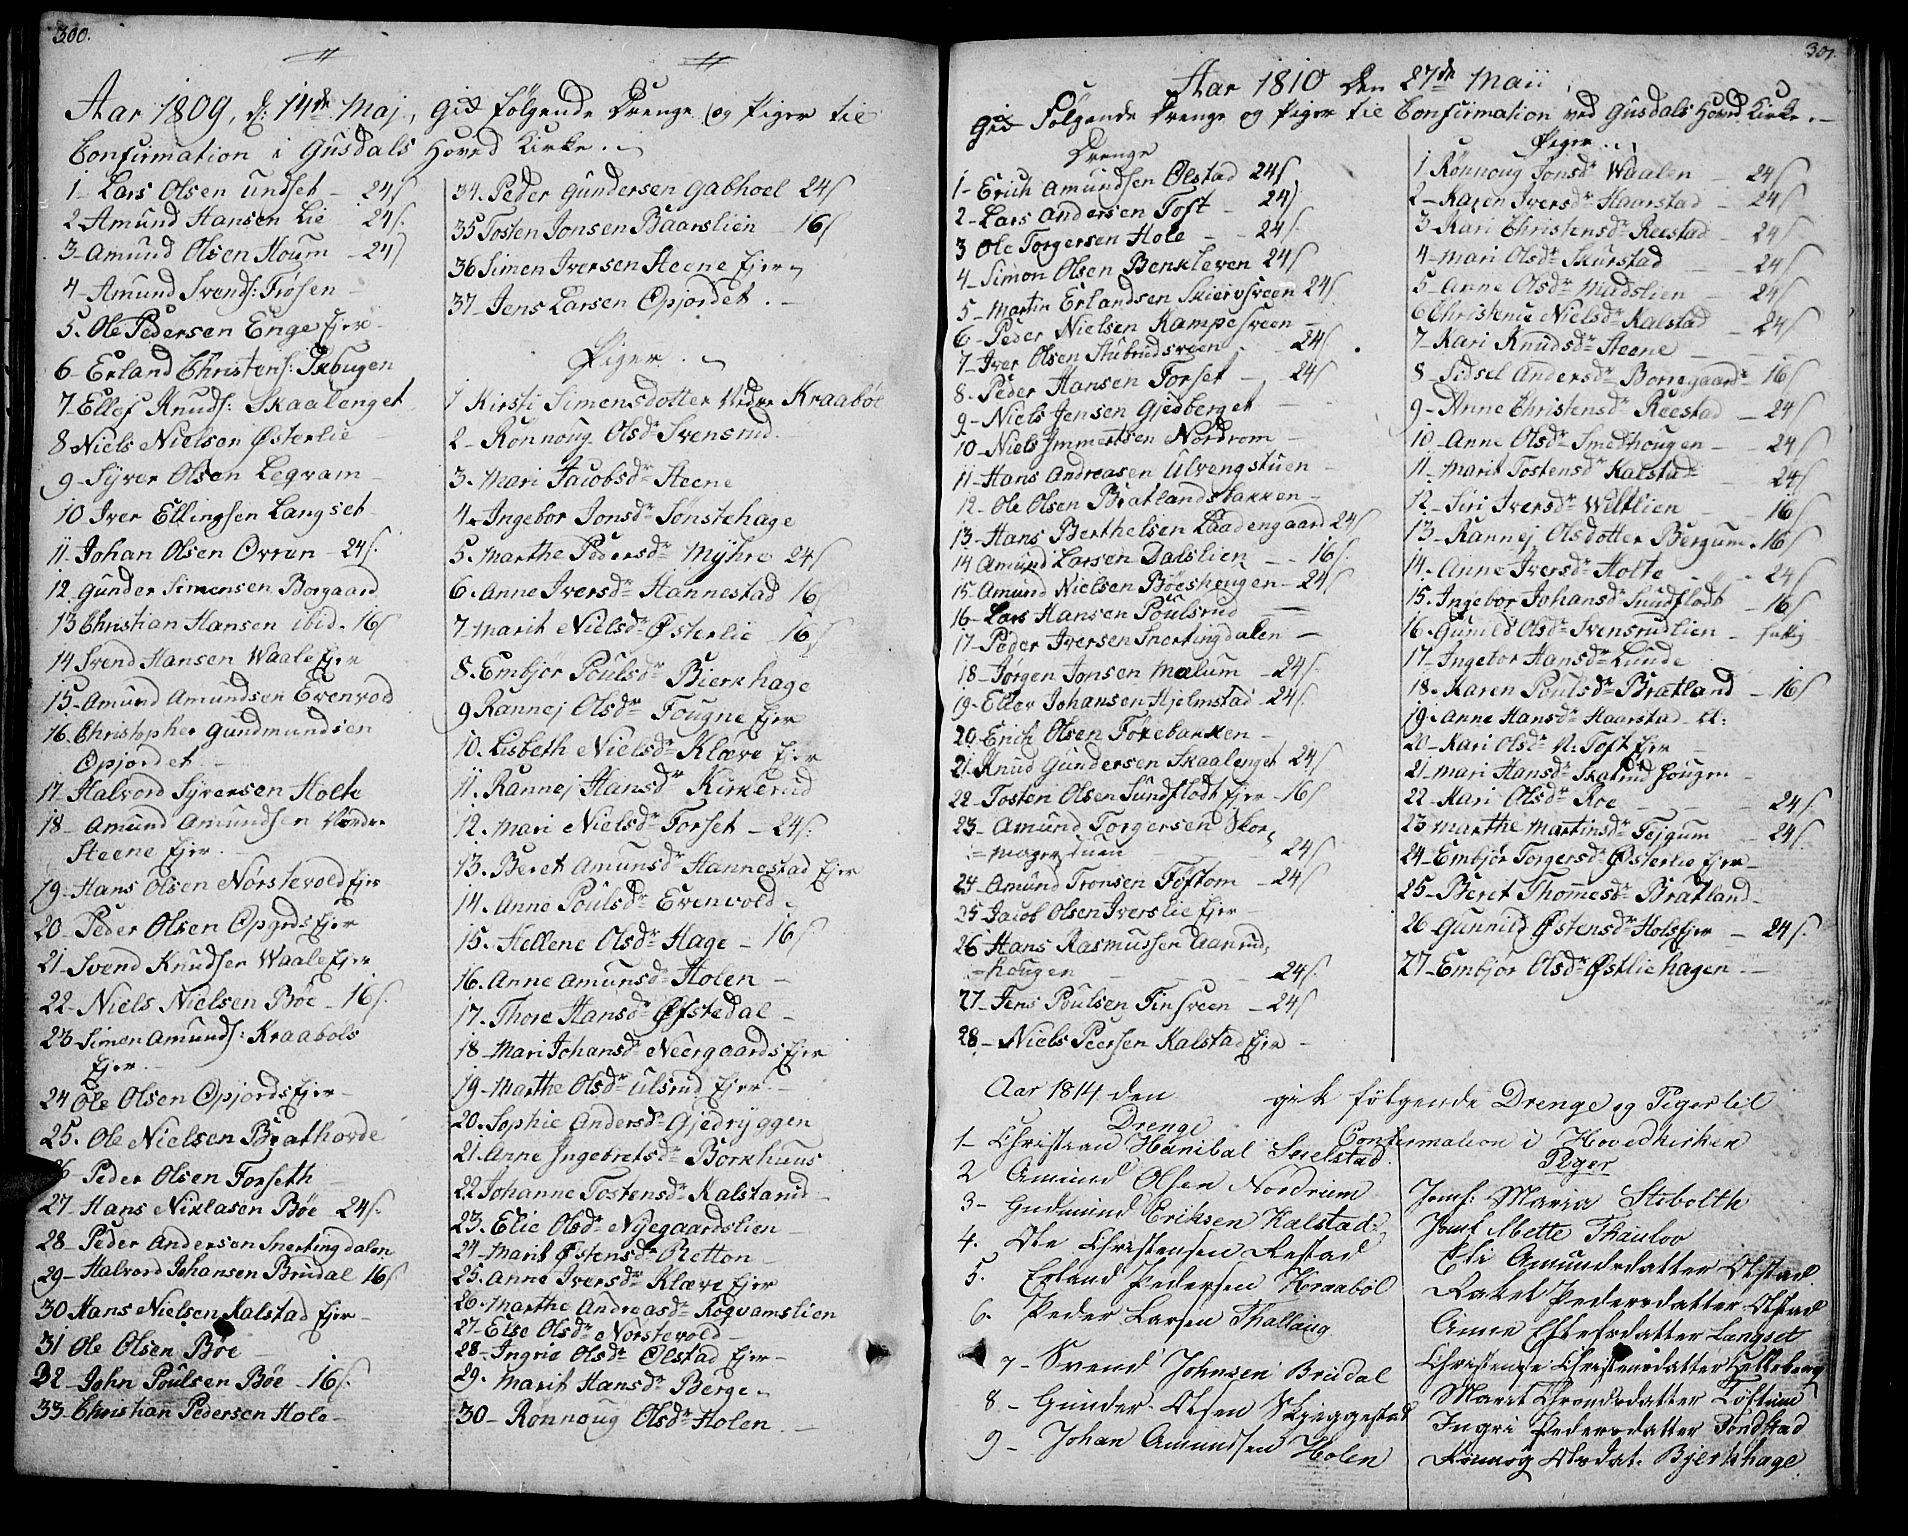 SAH, Gausdal prestekontor, Ministerialbok nr. 4, 1809-1817, s. 300-301